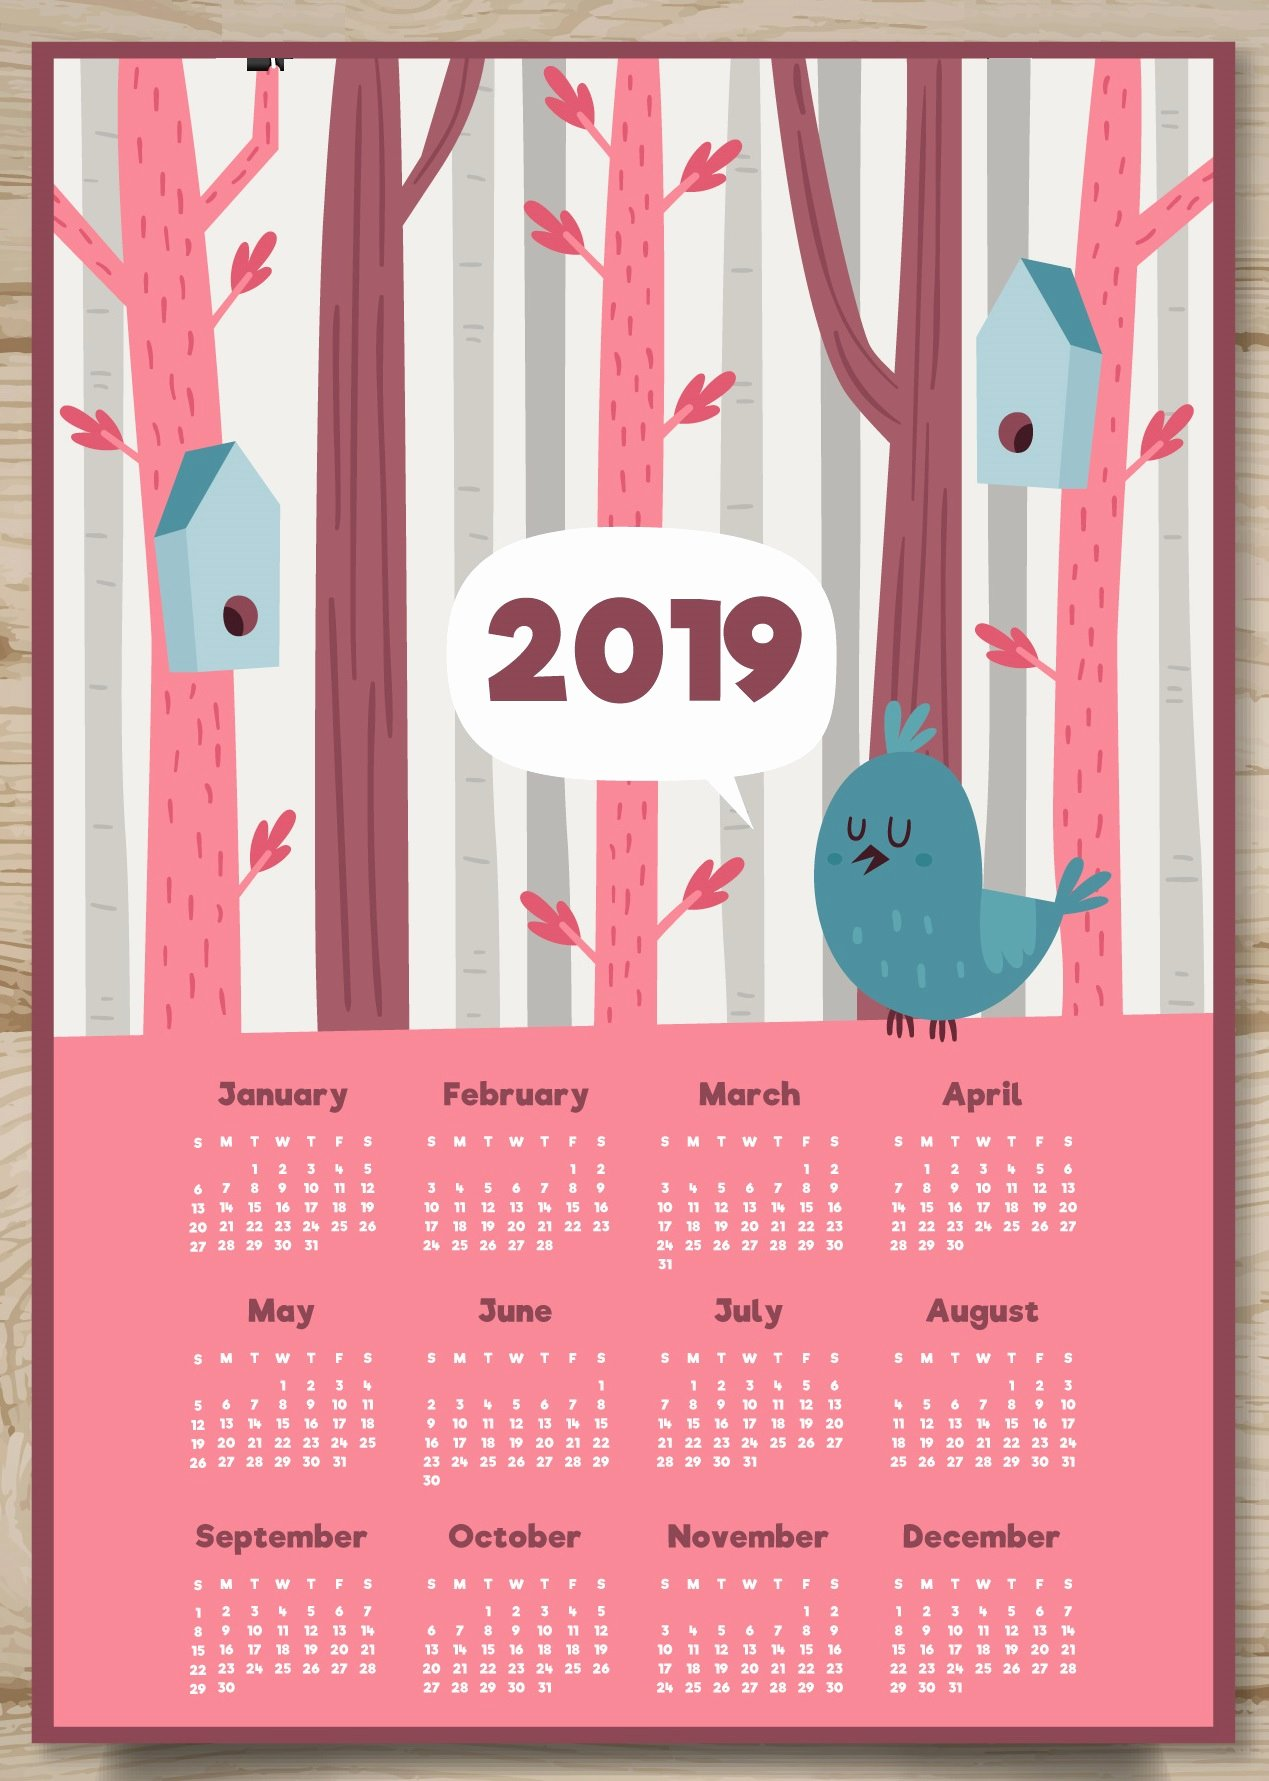 2019 Cute Calendar Printable Fresh Cute 2019 Printable Calendar